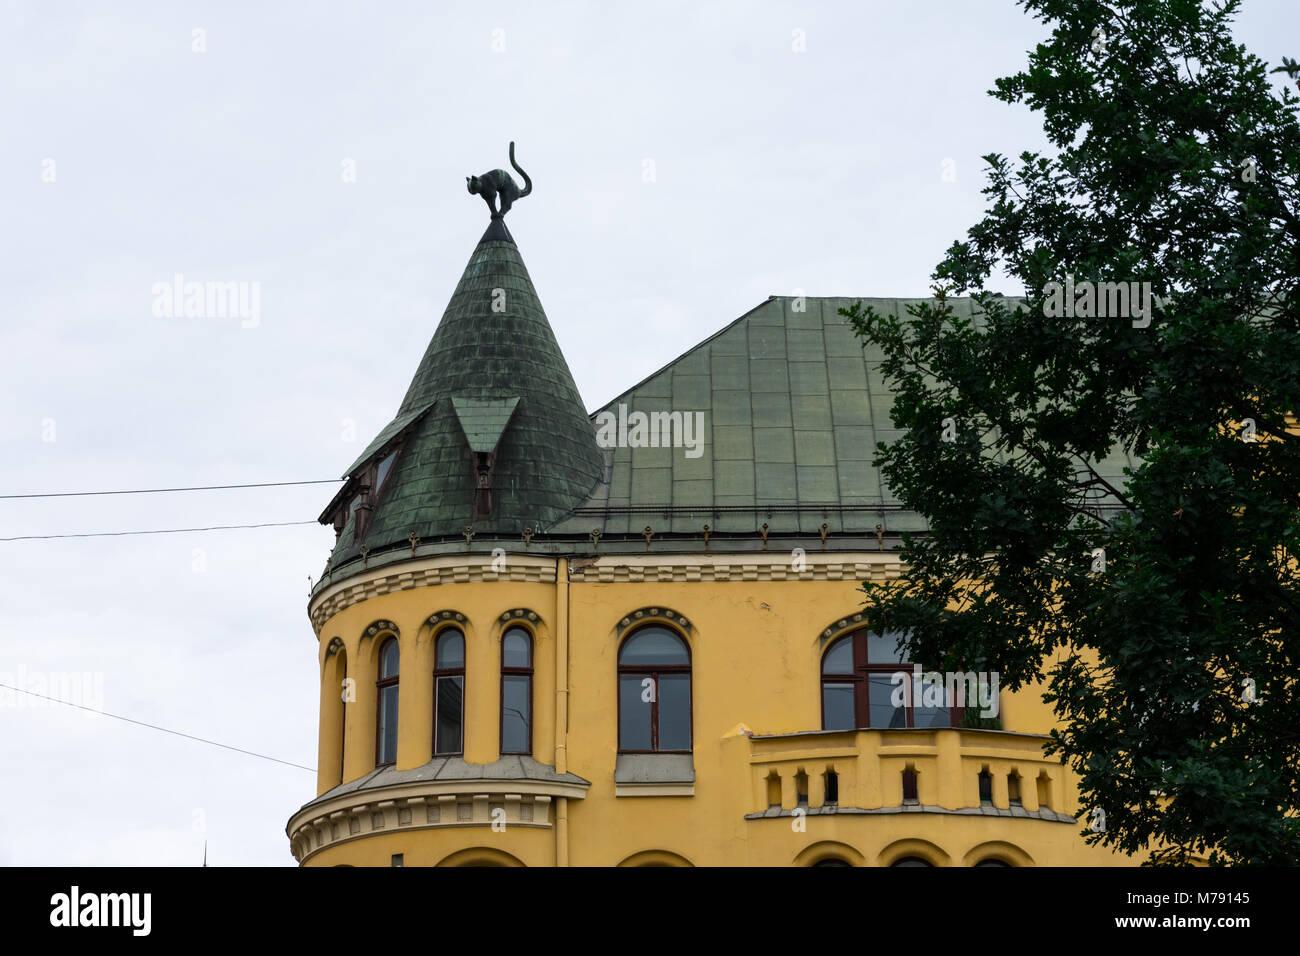 The Cat House (Kaku nams). Art Nouveau building. Riga, Latvia - Stock Image